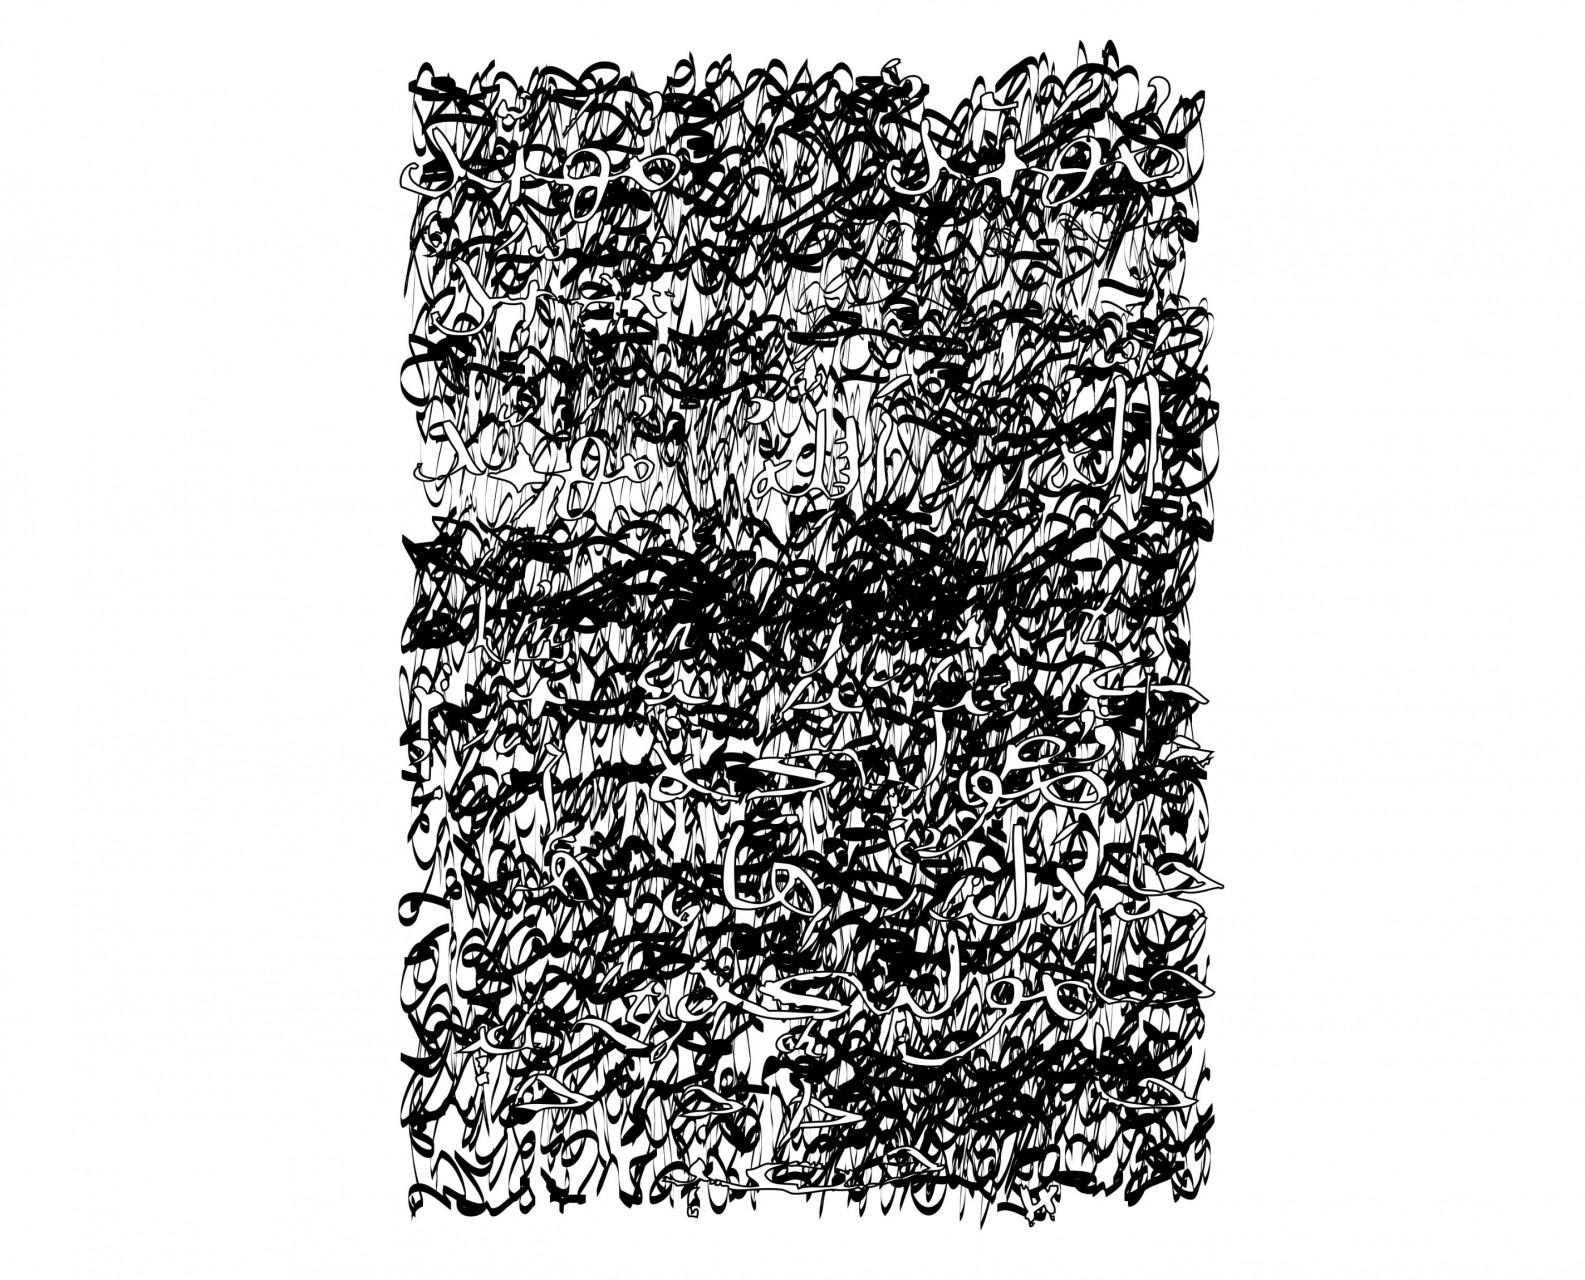 Palimpsest 014, Eco-Solvent Tinte auf LKW-Plane, 137 x 205 cm, 2017